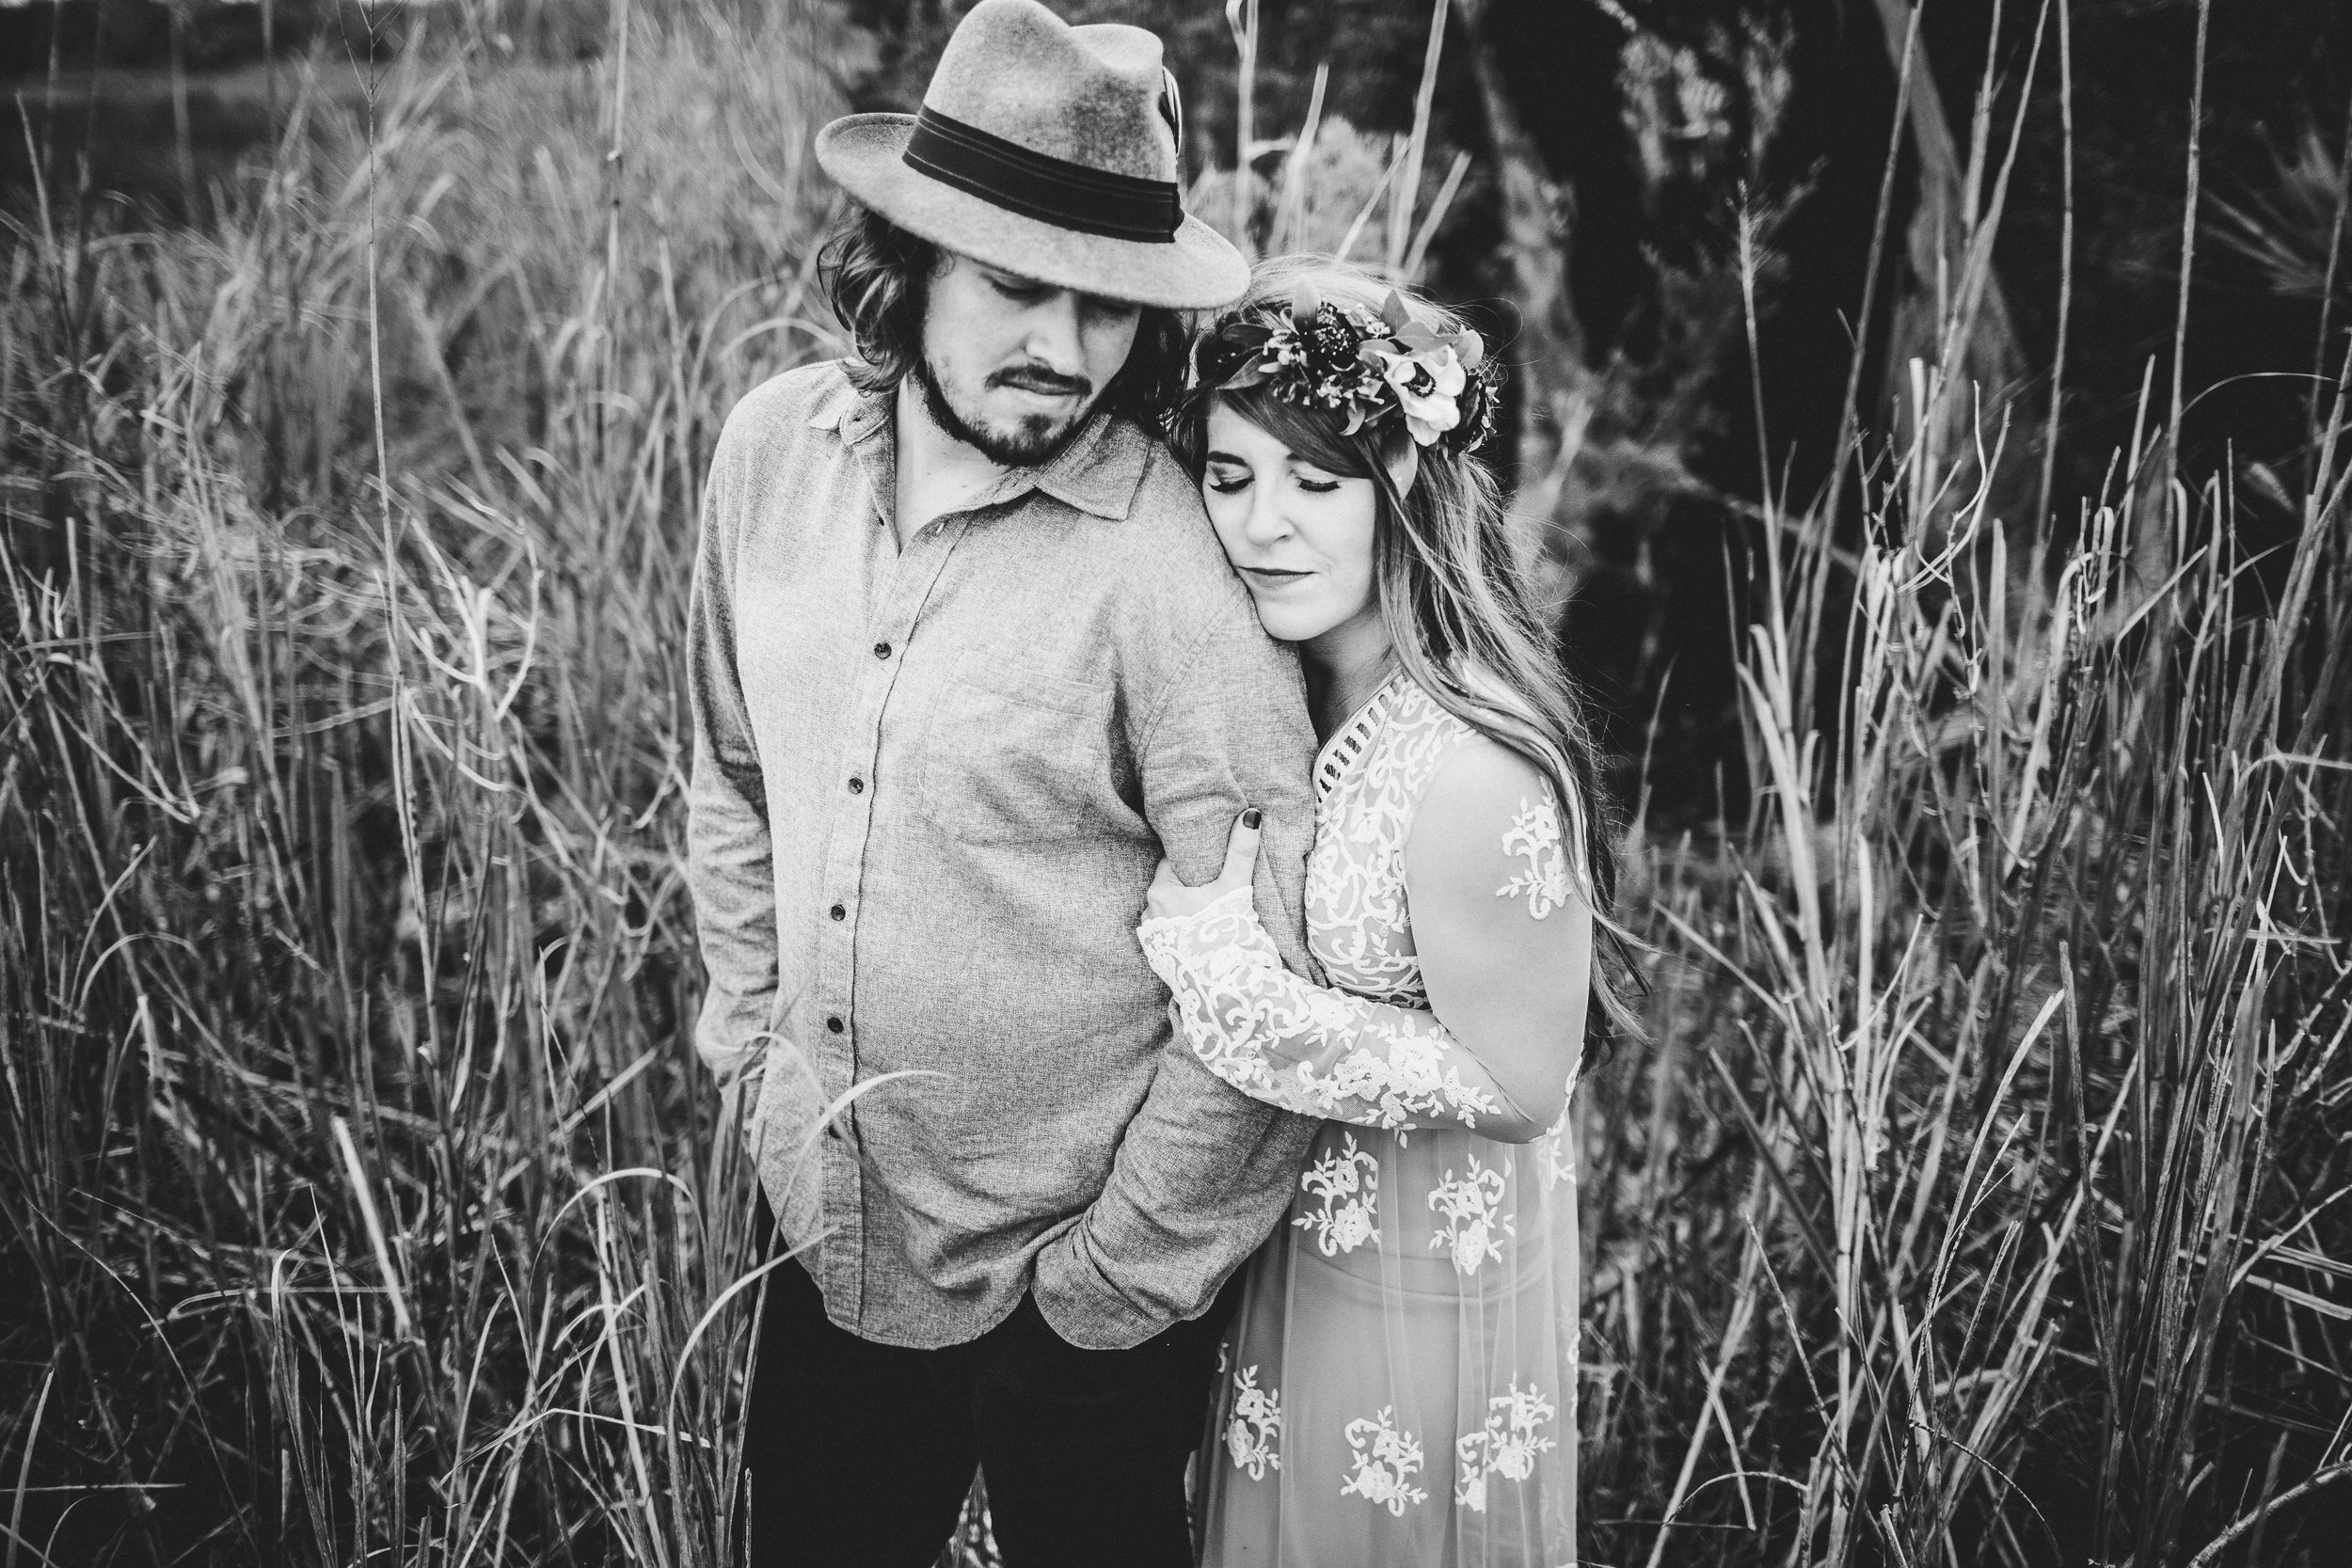 nicole-and-alex-engagement-session-ivory-and-beau-savannah-wedding-planner-savannah-event-designer-mason-matrimony-2018-savannah-weddings-florist-engagement-ivory-and-beau.jpg